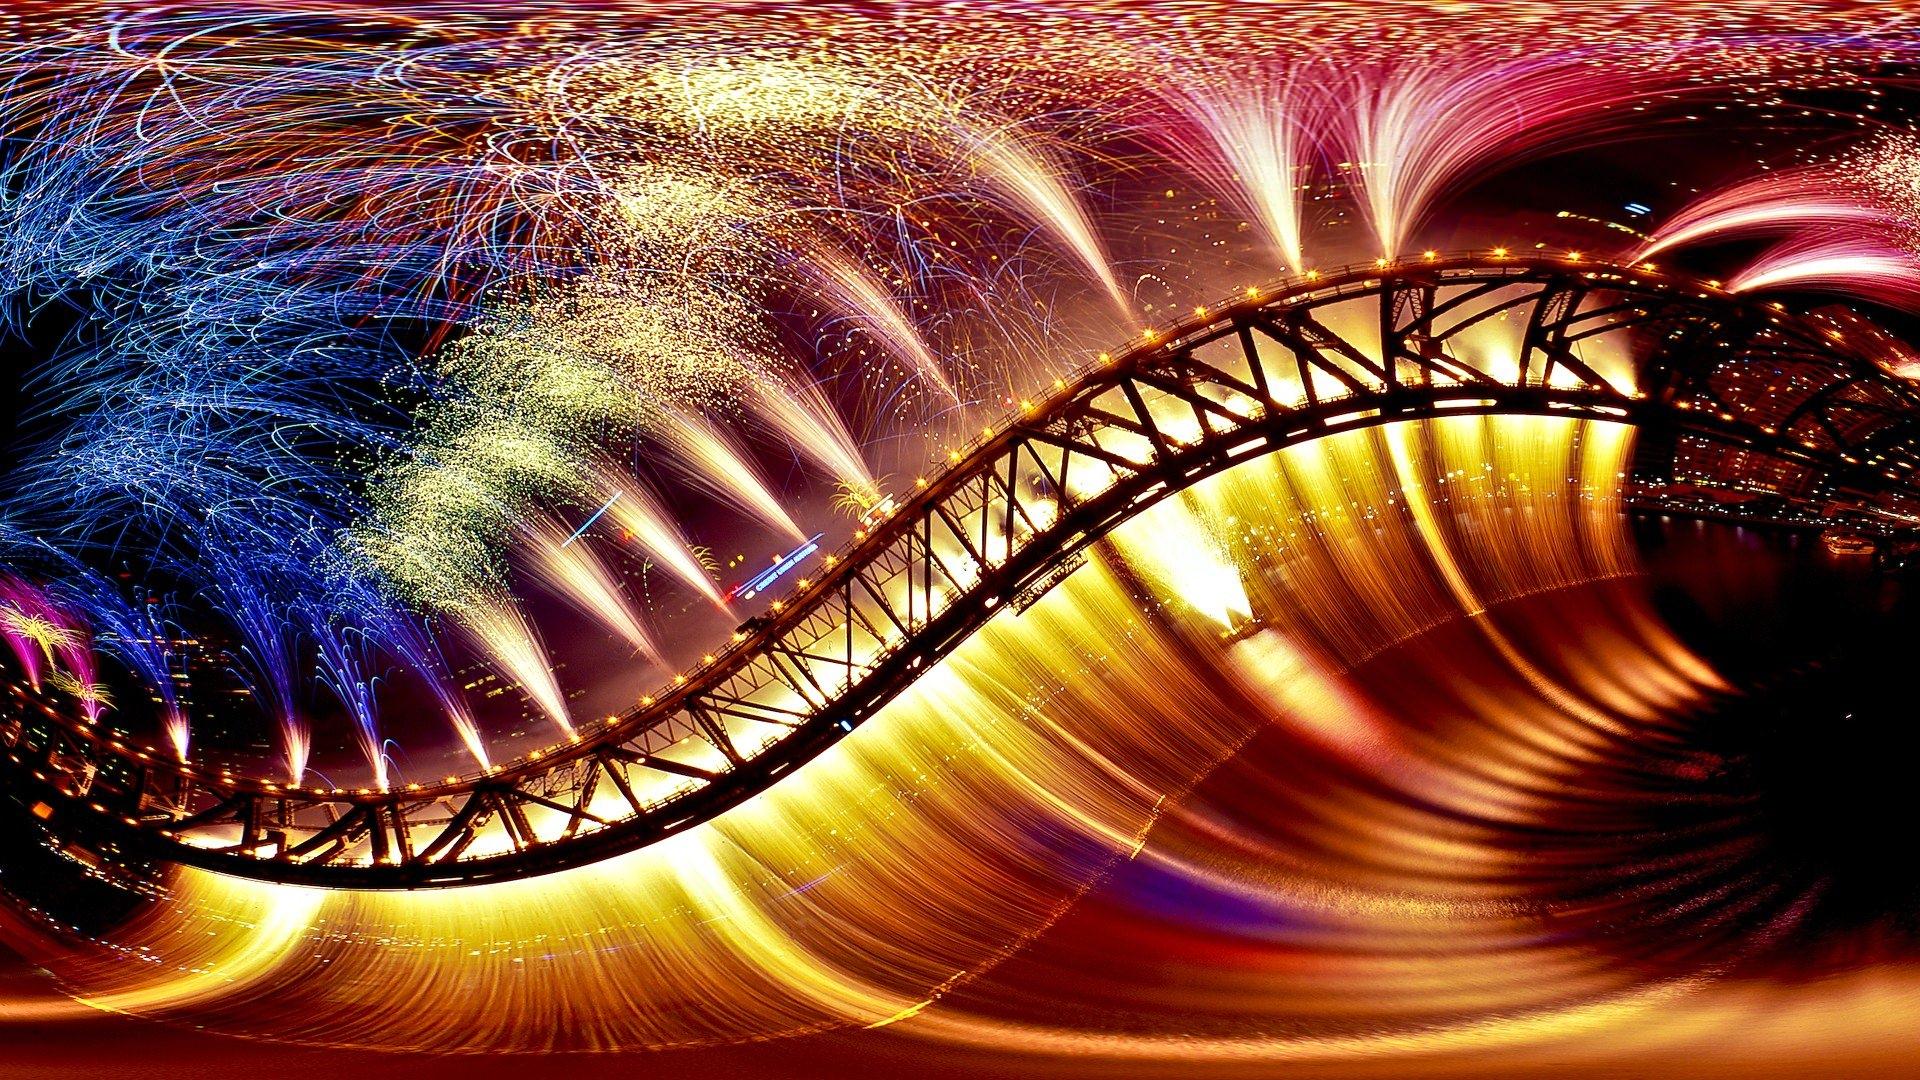 Fireworks on Bridge Wallpaper